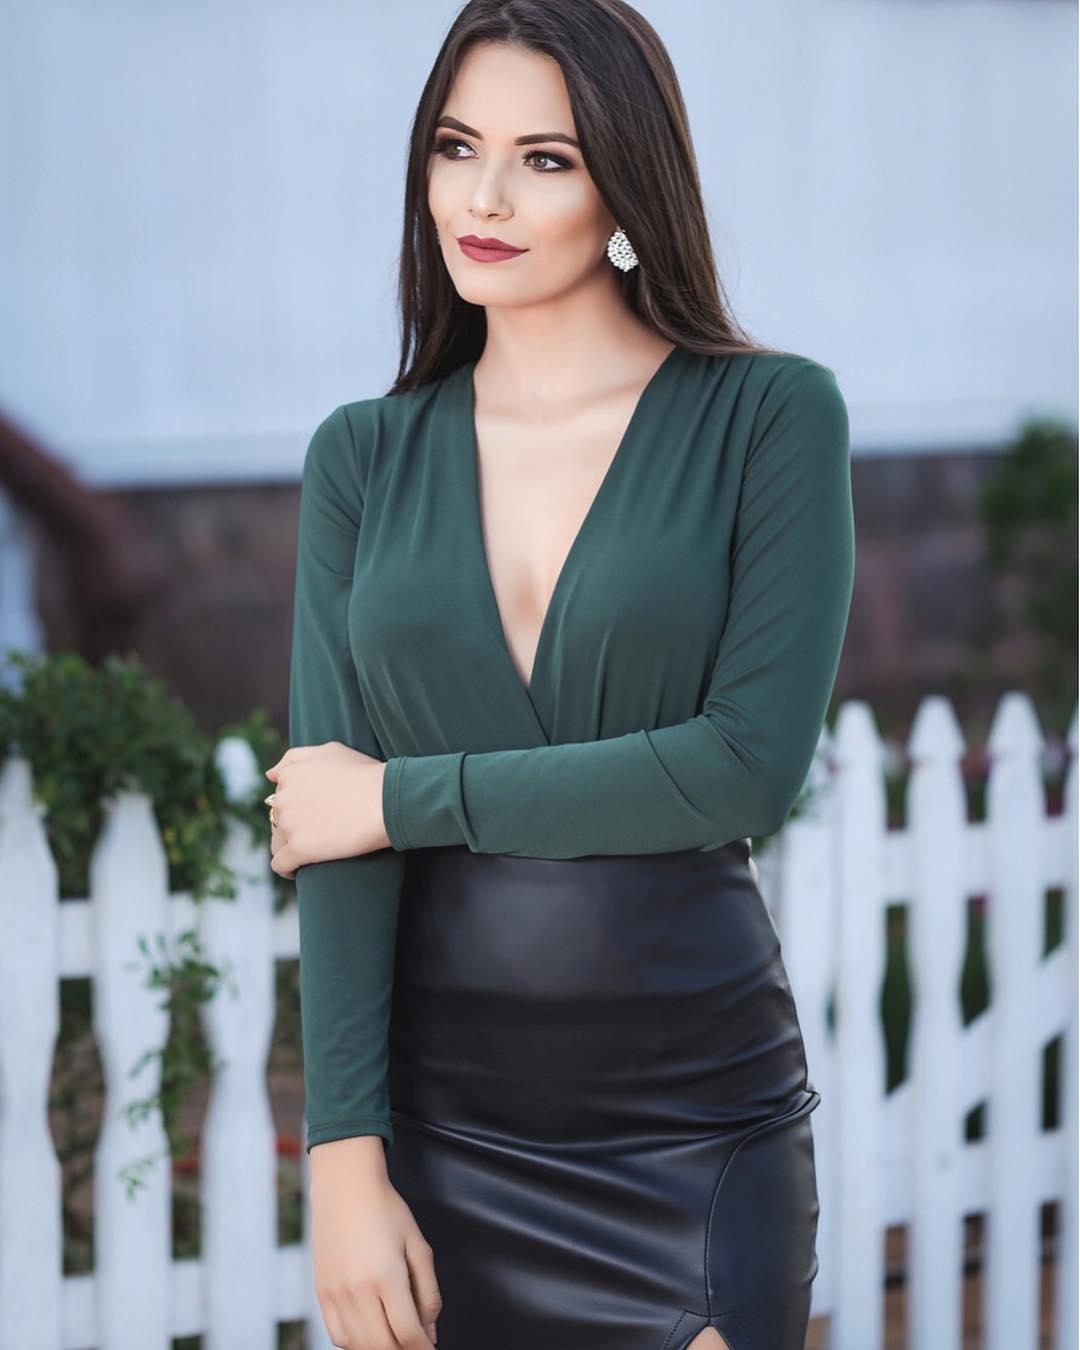 karine martovicz, miss eco fernando de noronha 2019. 34729810